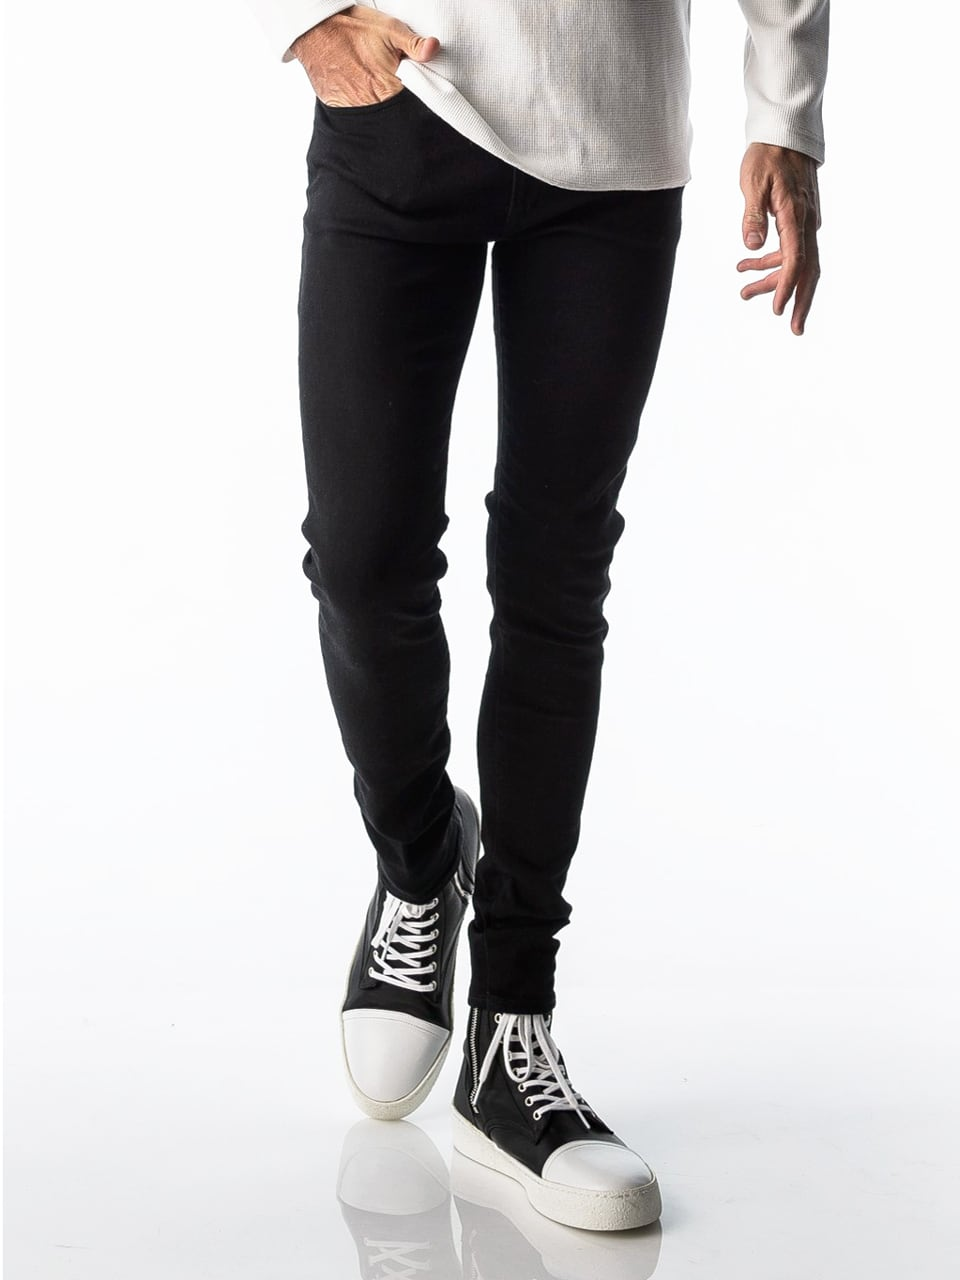 RESOUND CLOTHING (リサウンドクロージング) LOAD DENIM / BLACK O/W BASIC-SSK-004-2